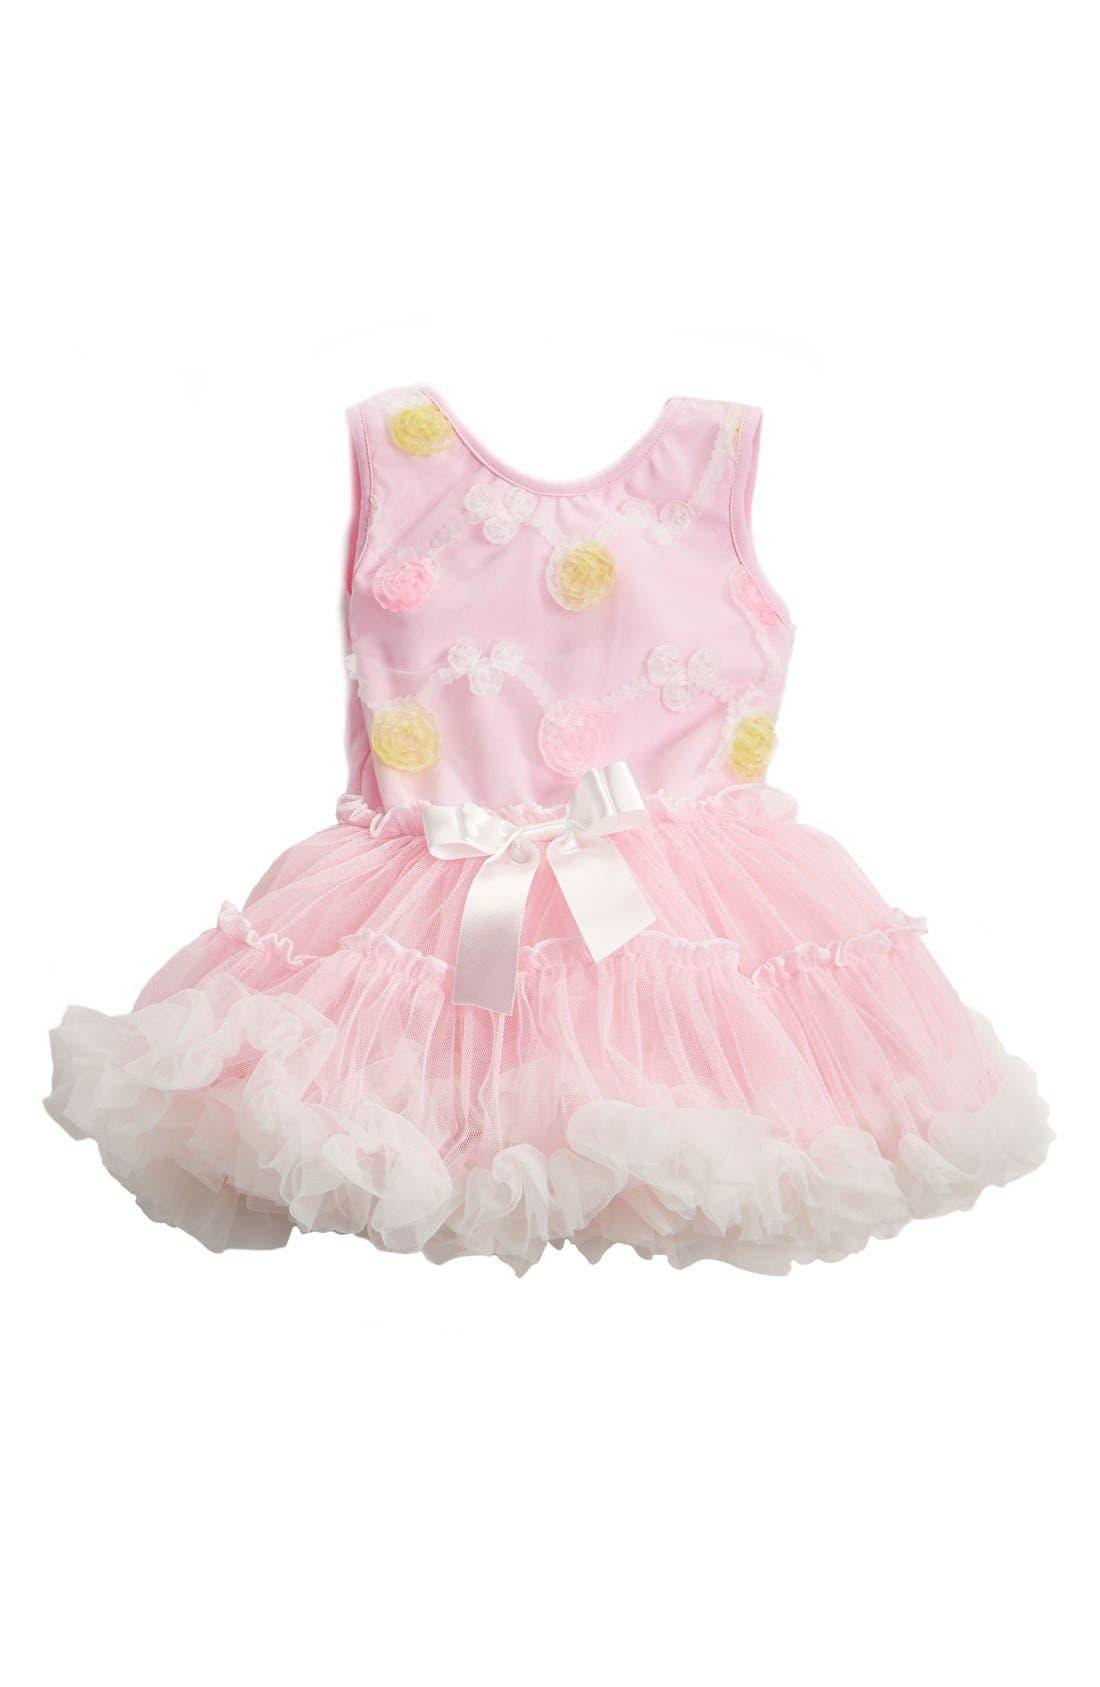 Main Image - Popatu Floral Pettidress (Baby Girls)